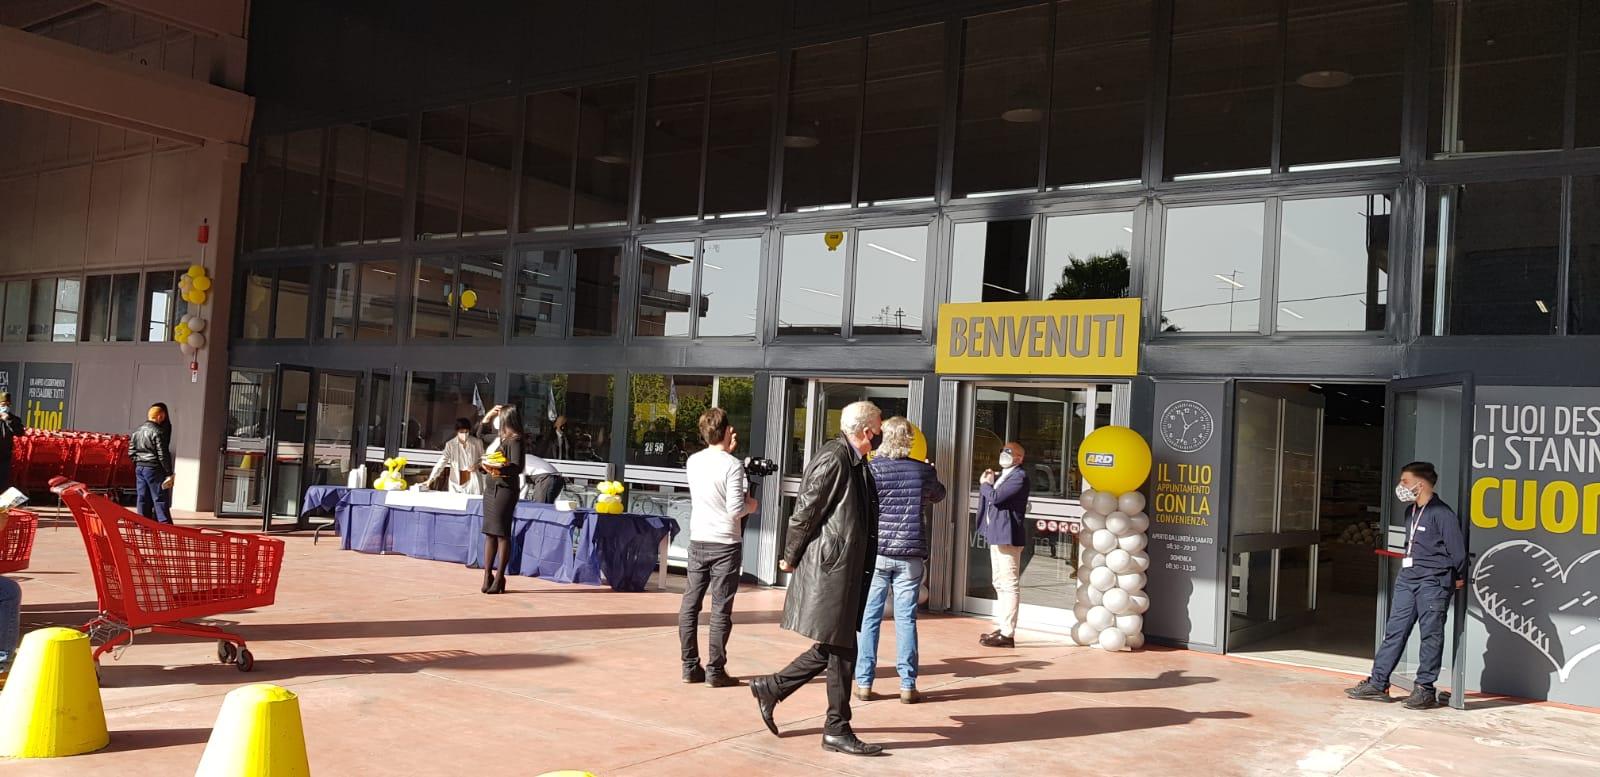 A Montepalma nel catanese apre un nuovo punto vendita ARD - ARD Discount